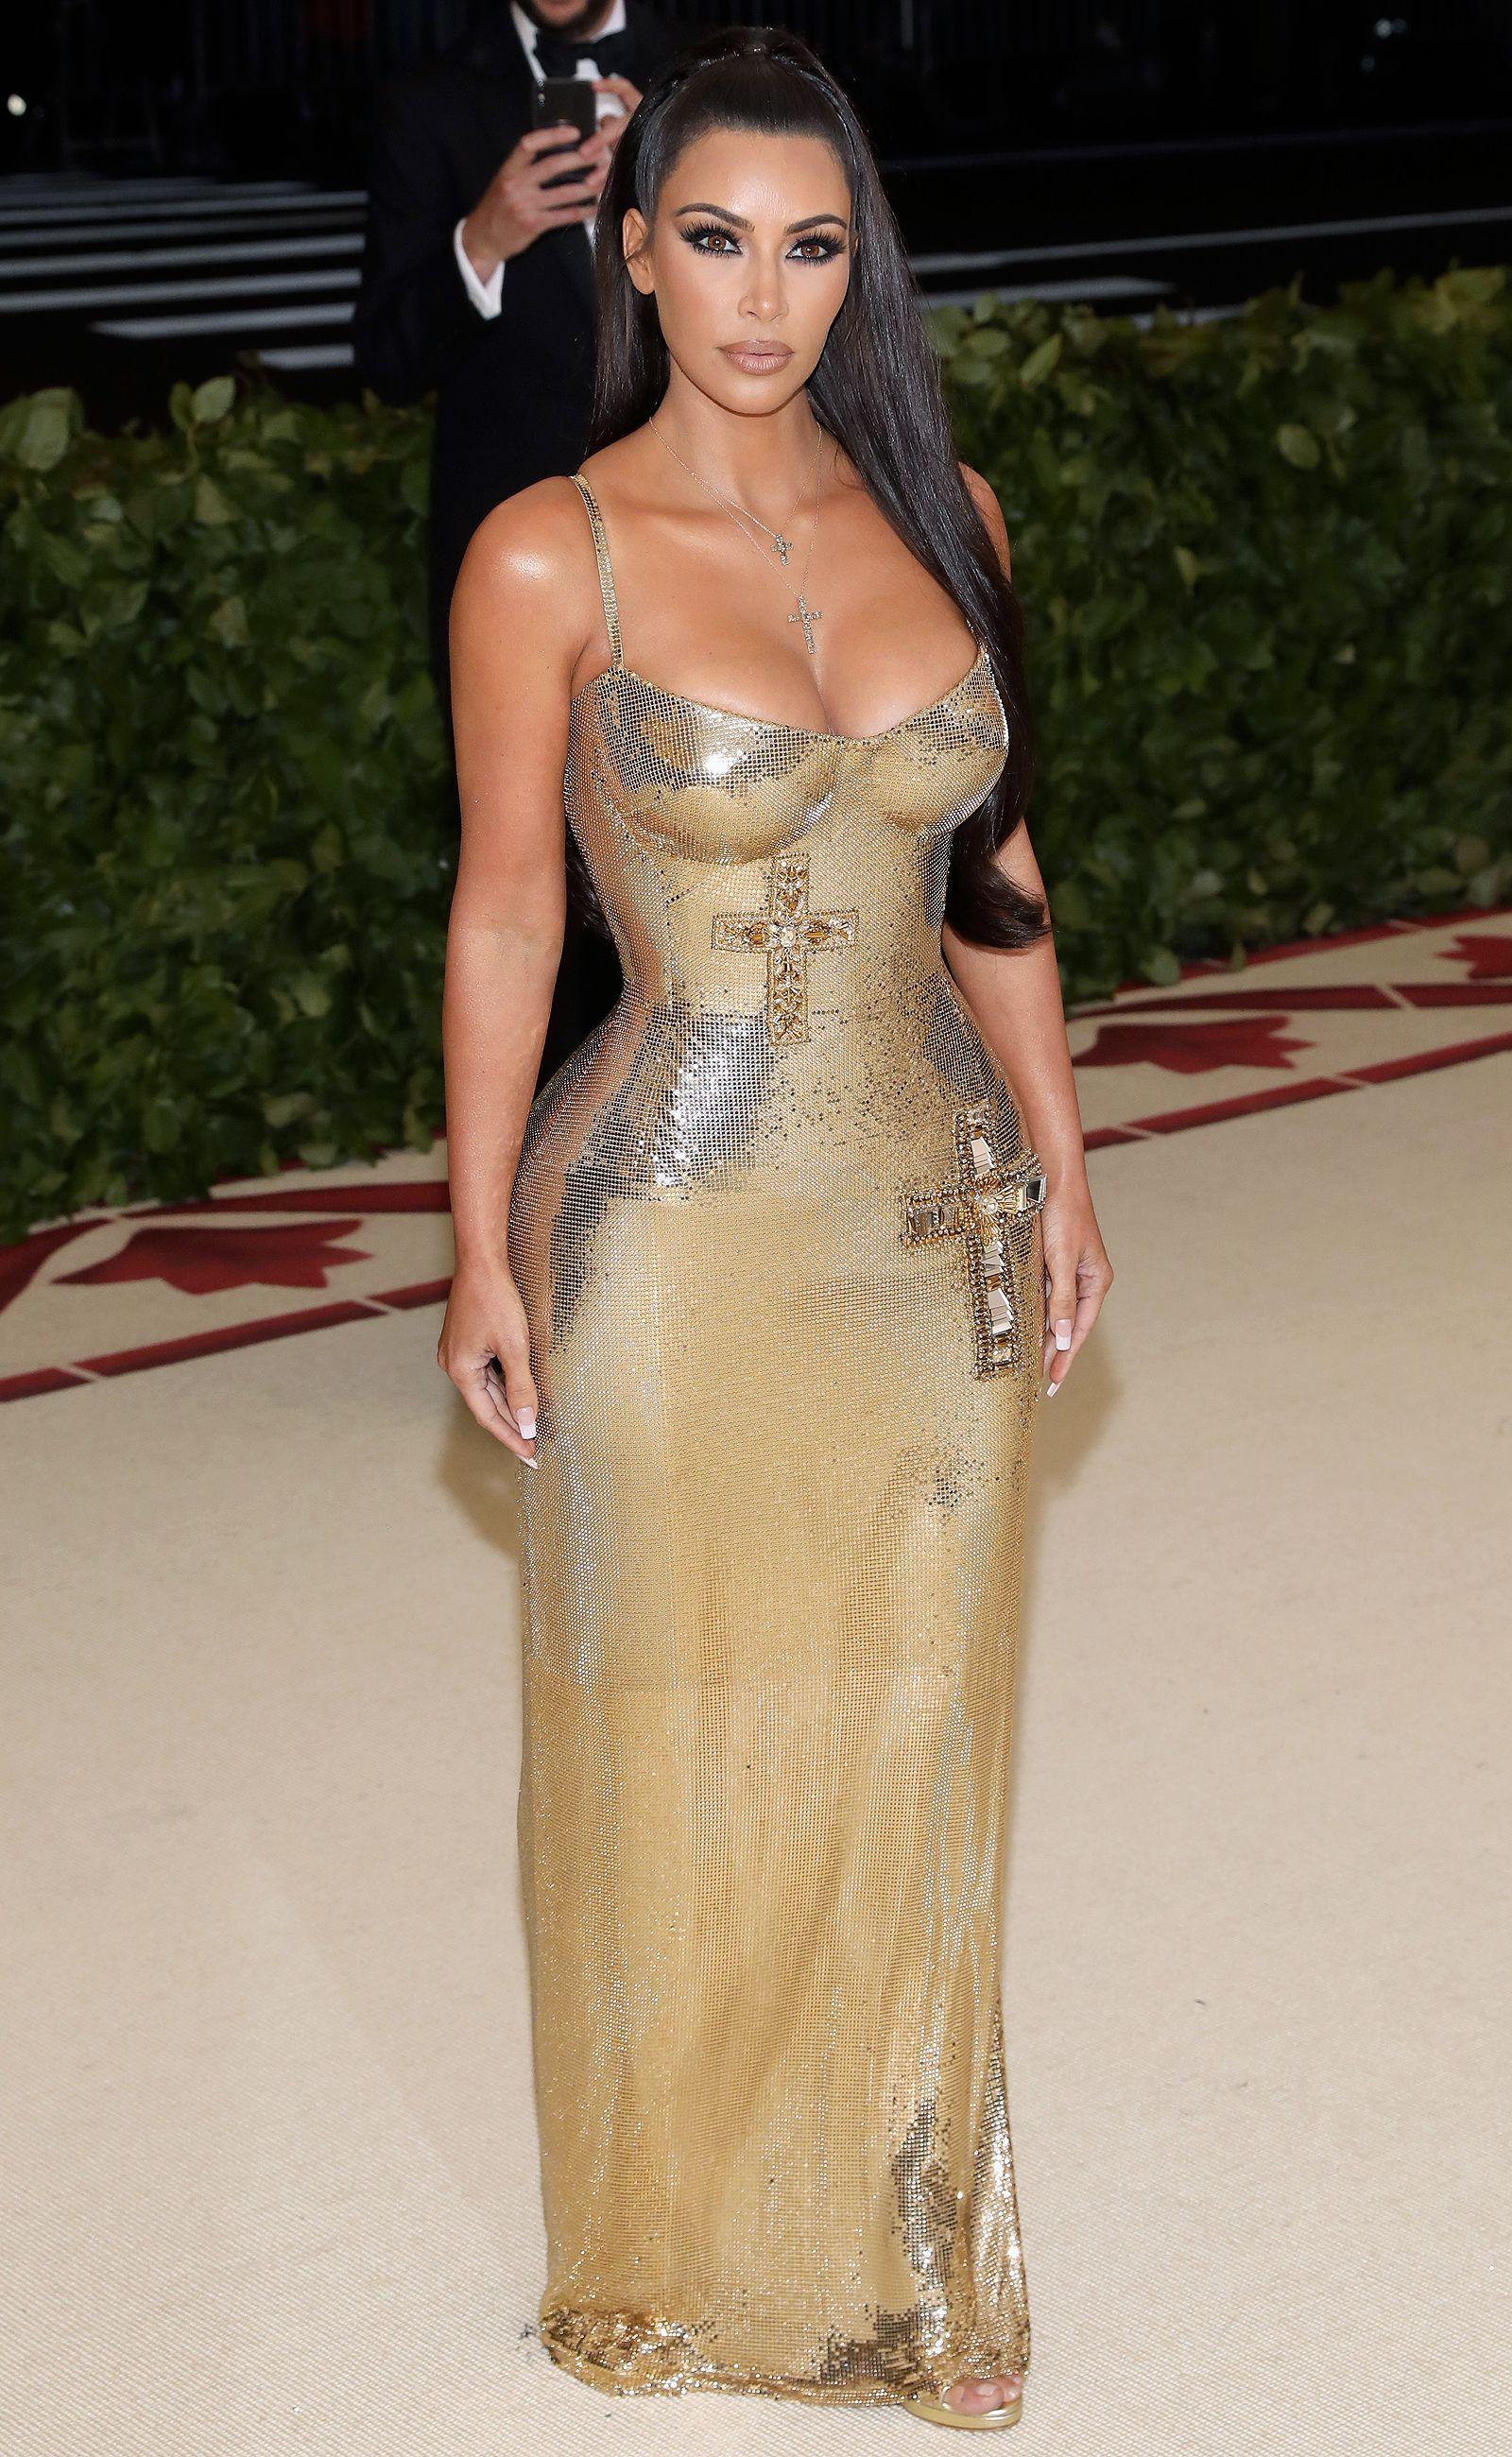 ec5996cf638 Kim Kardashian Attends the 2018 Met Gala without Kanye West Wearing Sexy  Gold Versace Dress